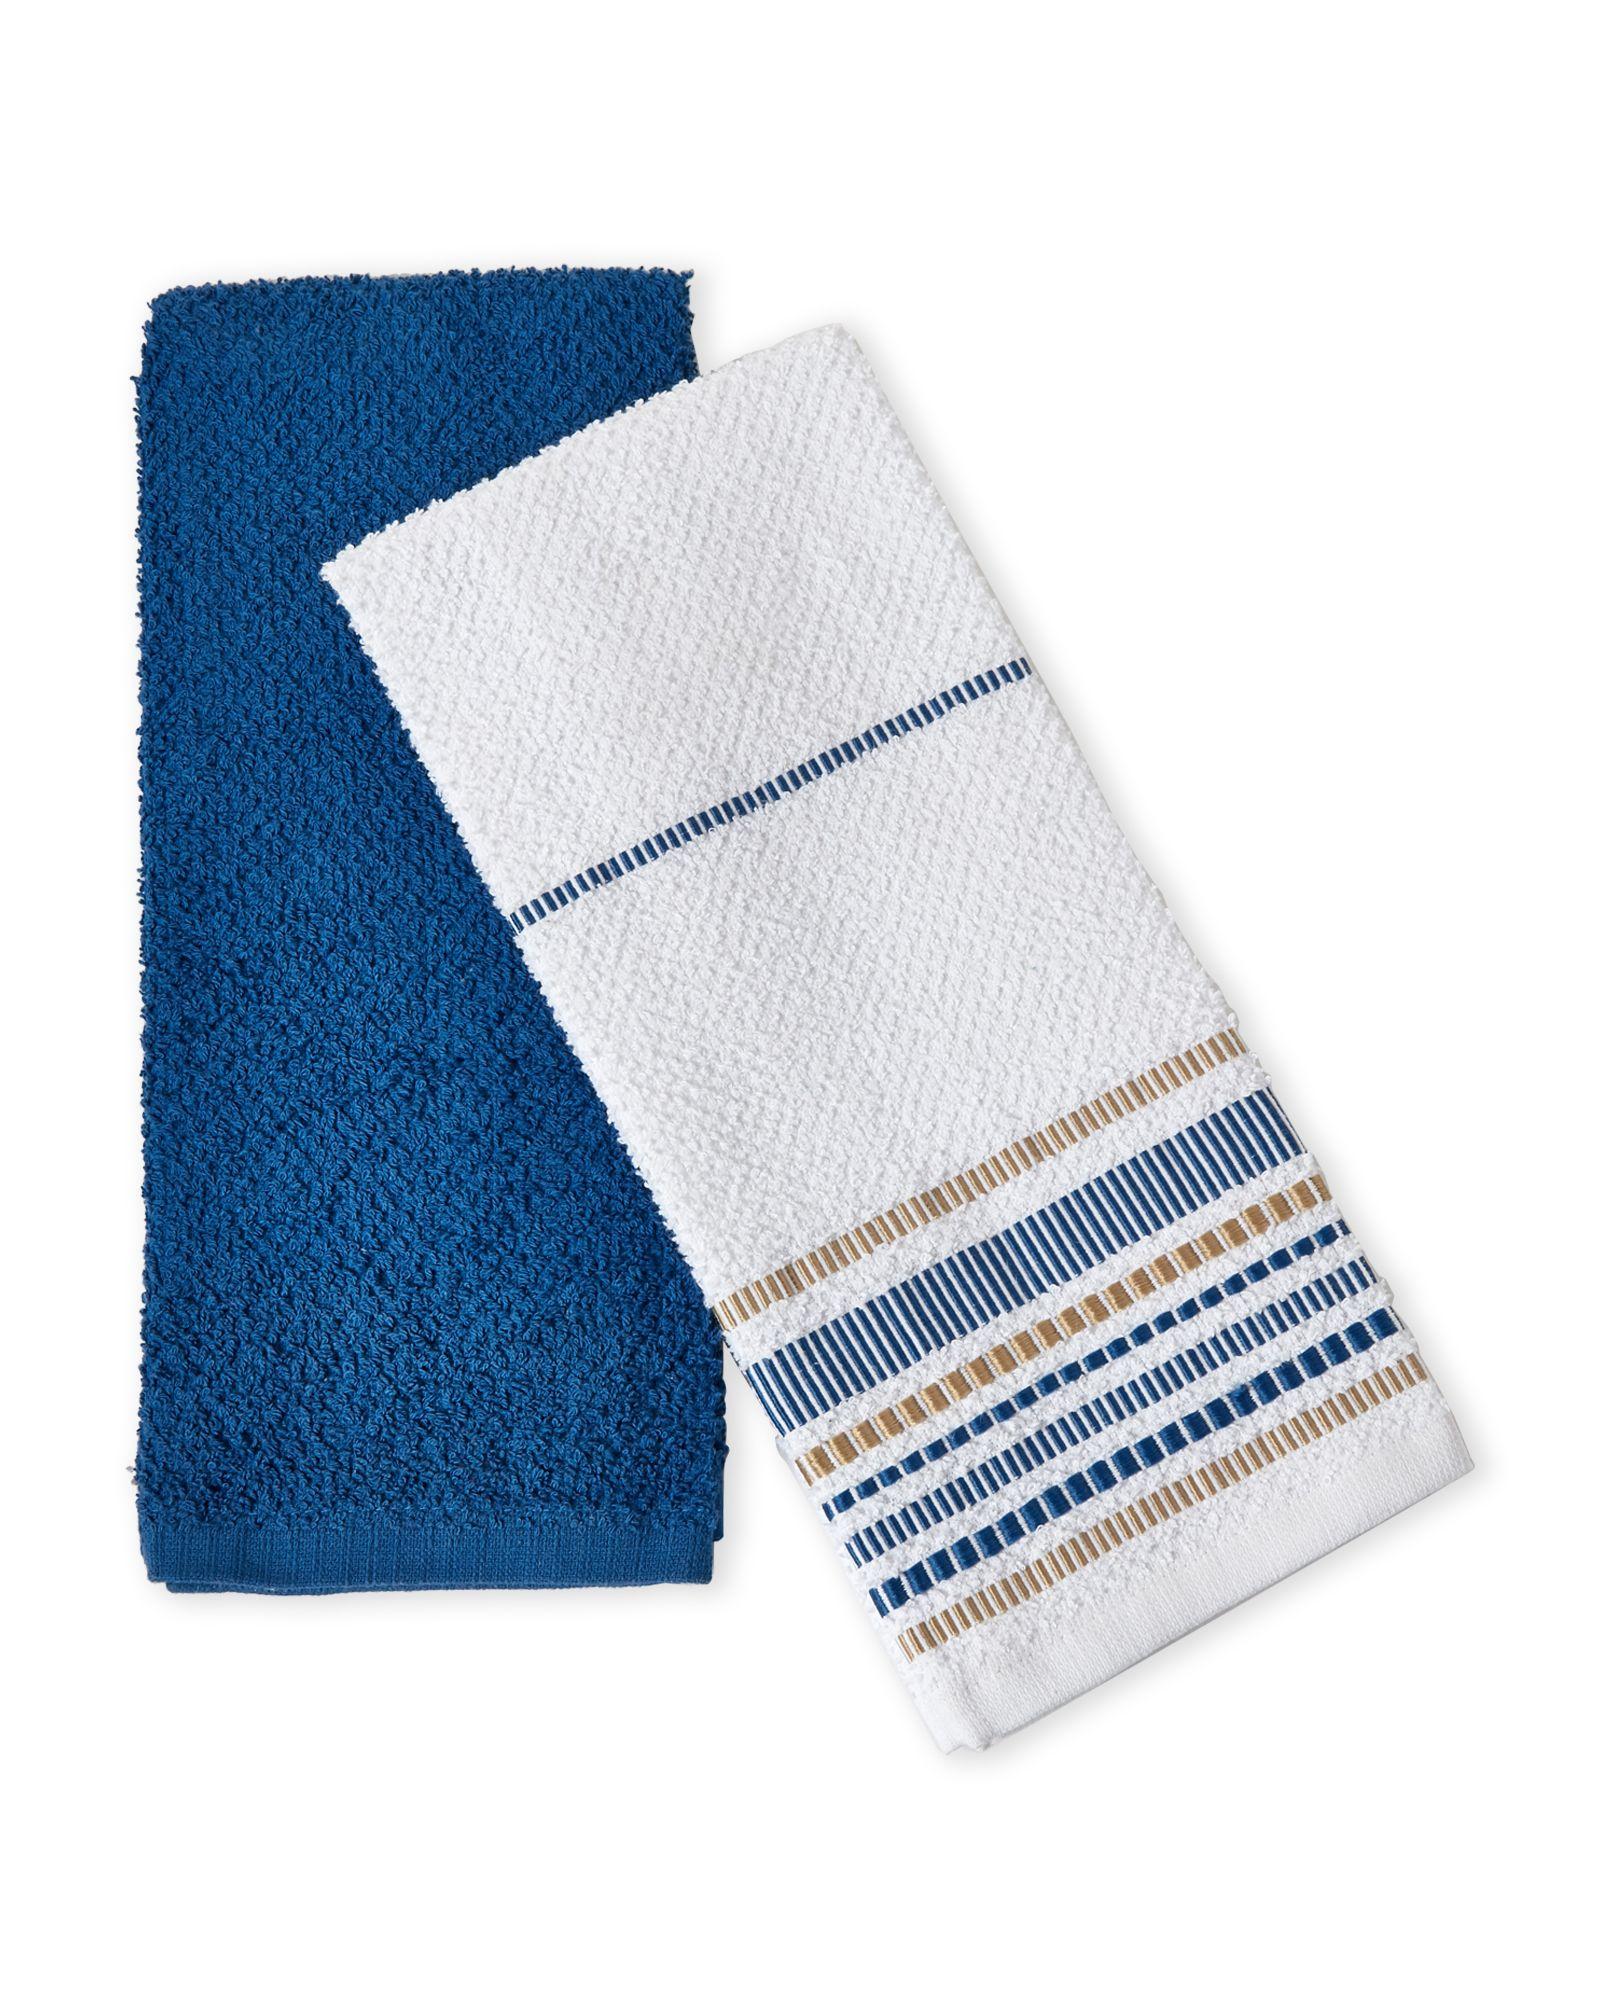 Soho Kitchen 2-Piece Blue/White Embroidered Kitchen Towels